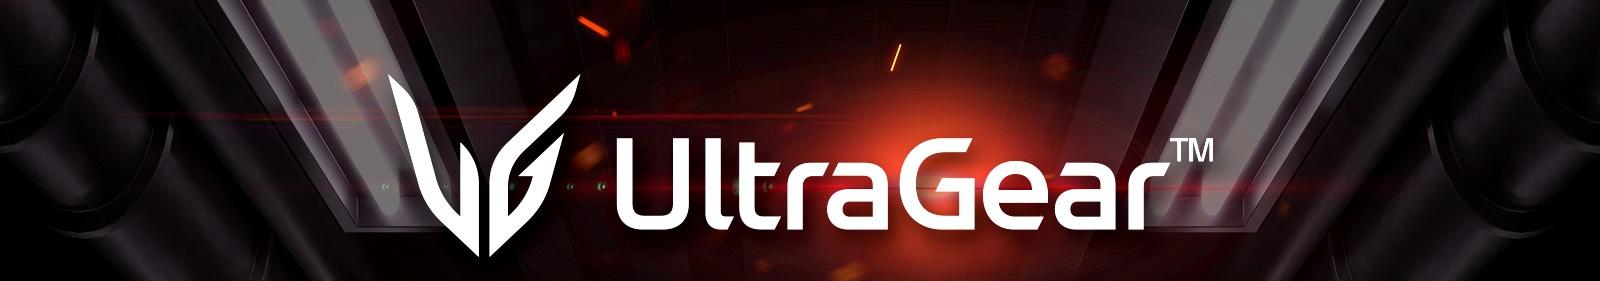 UltraGear™ Gaming Monitor